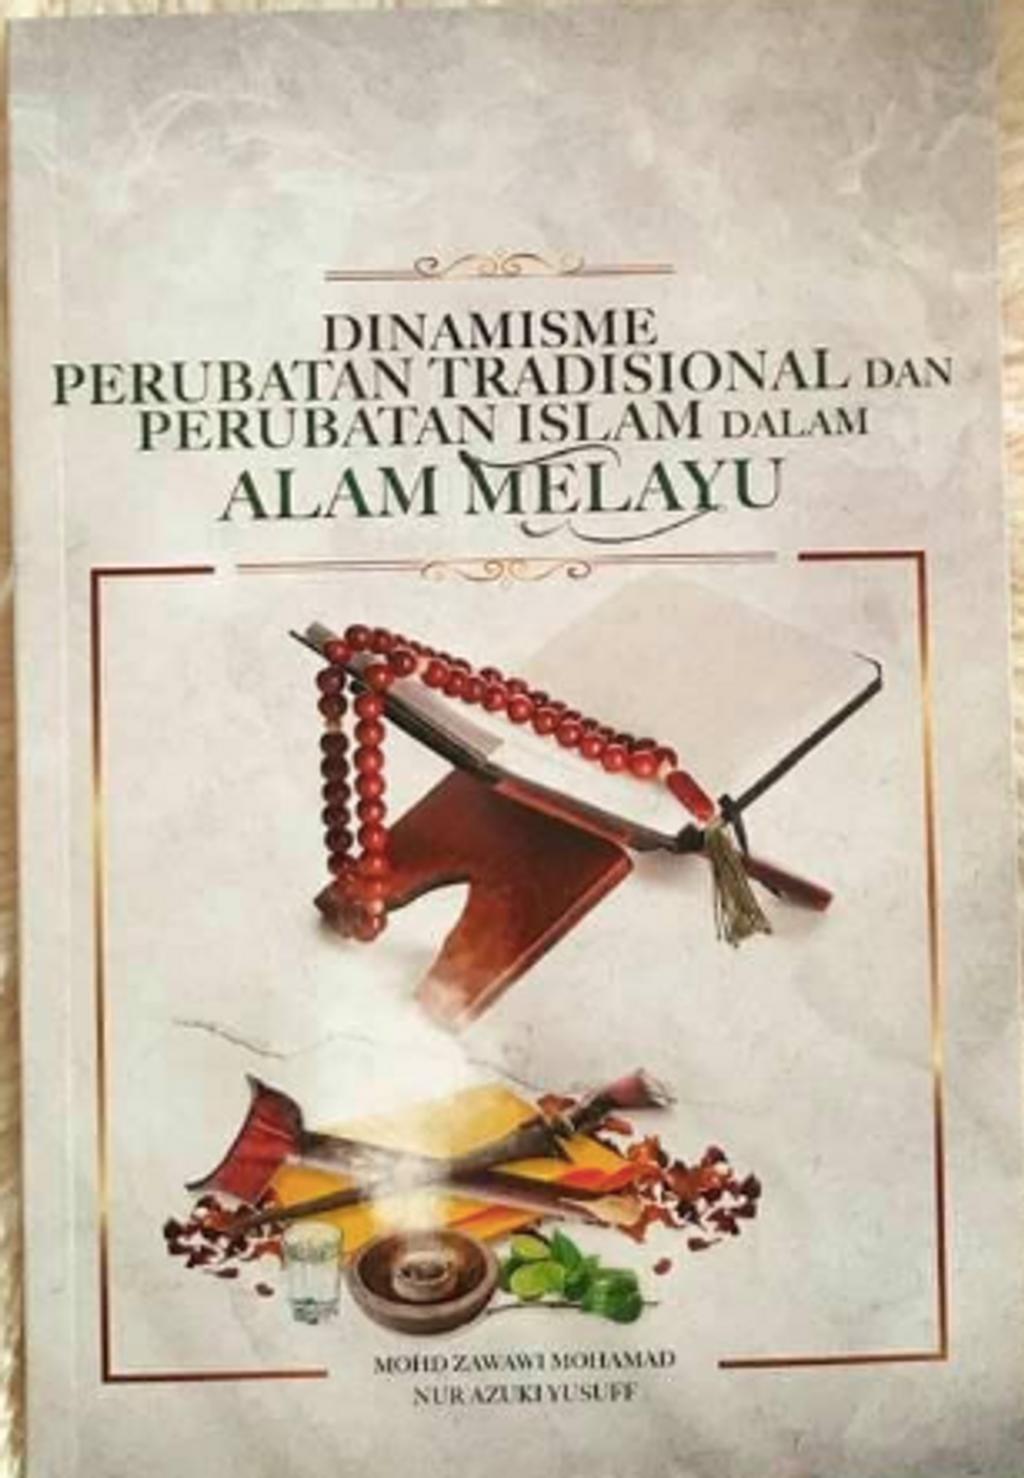 UMK Perubatan Melayu.png